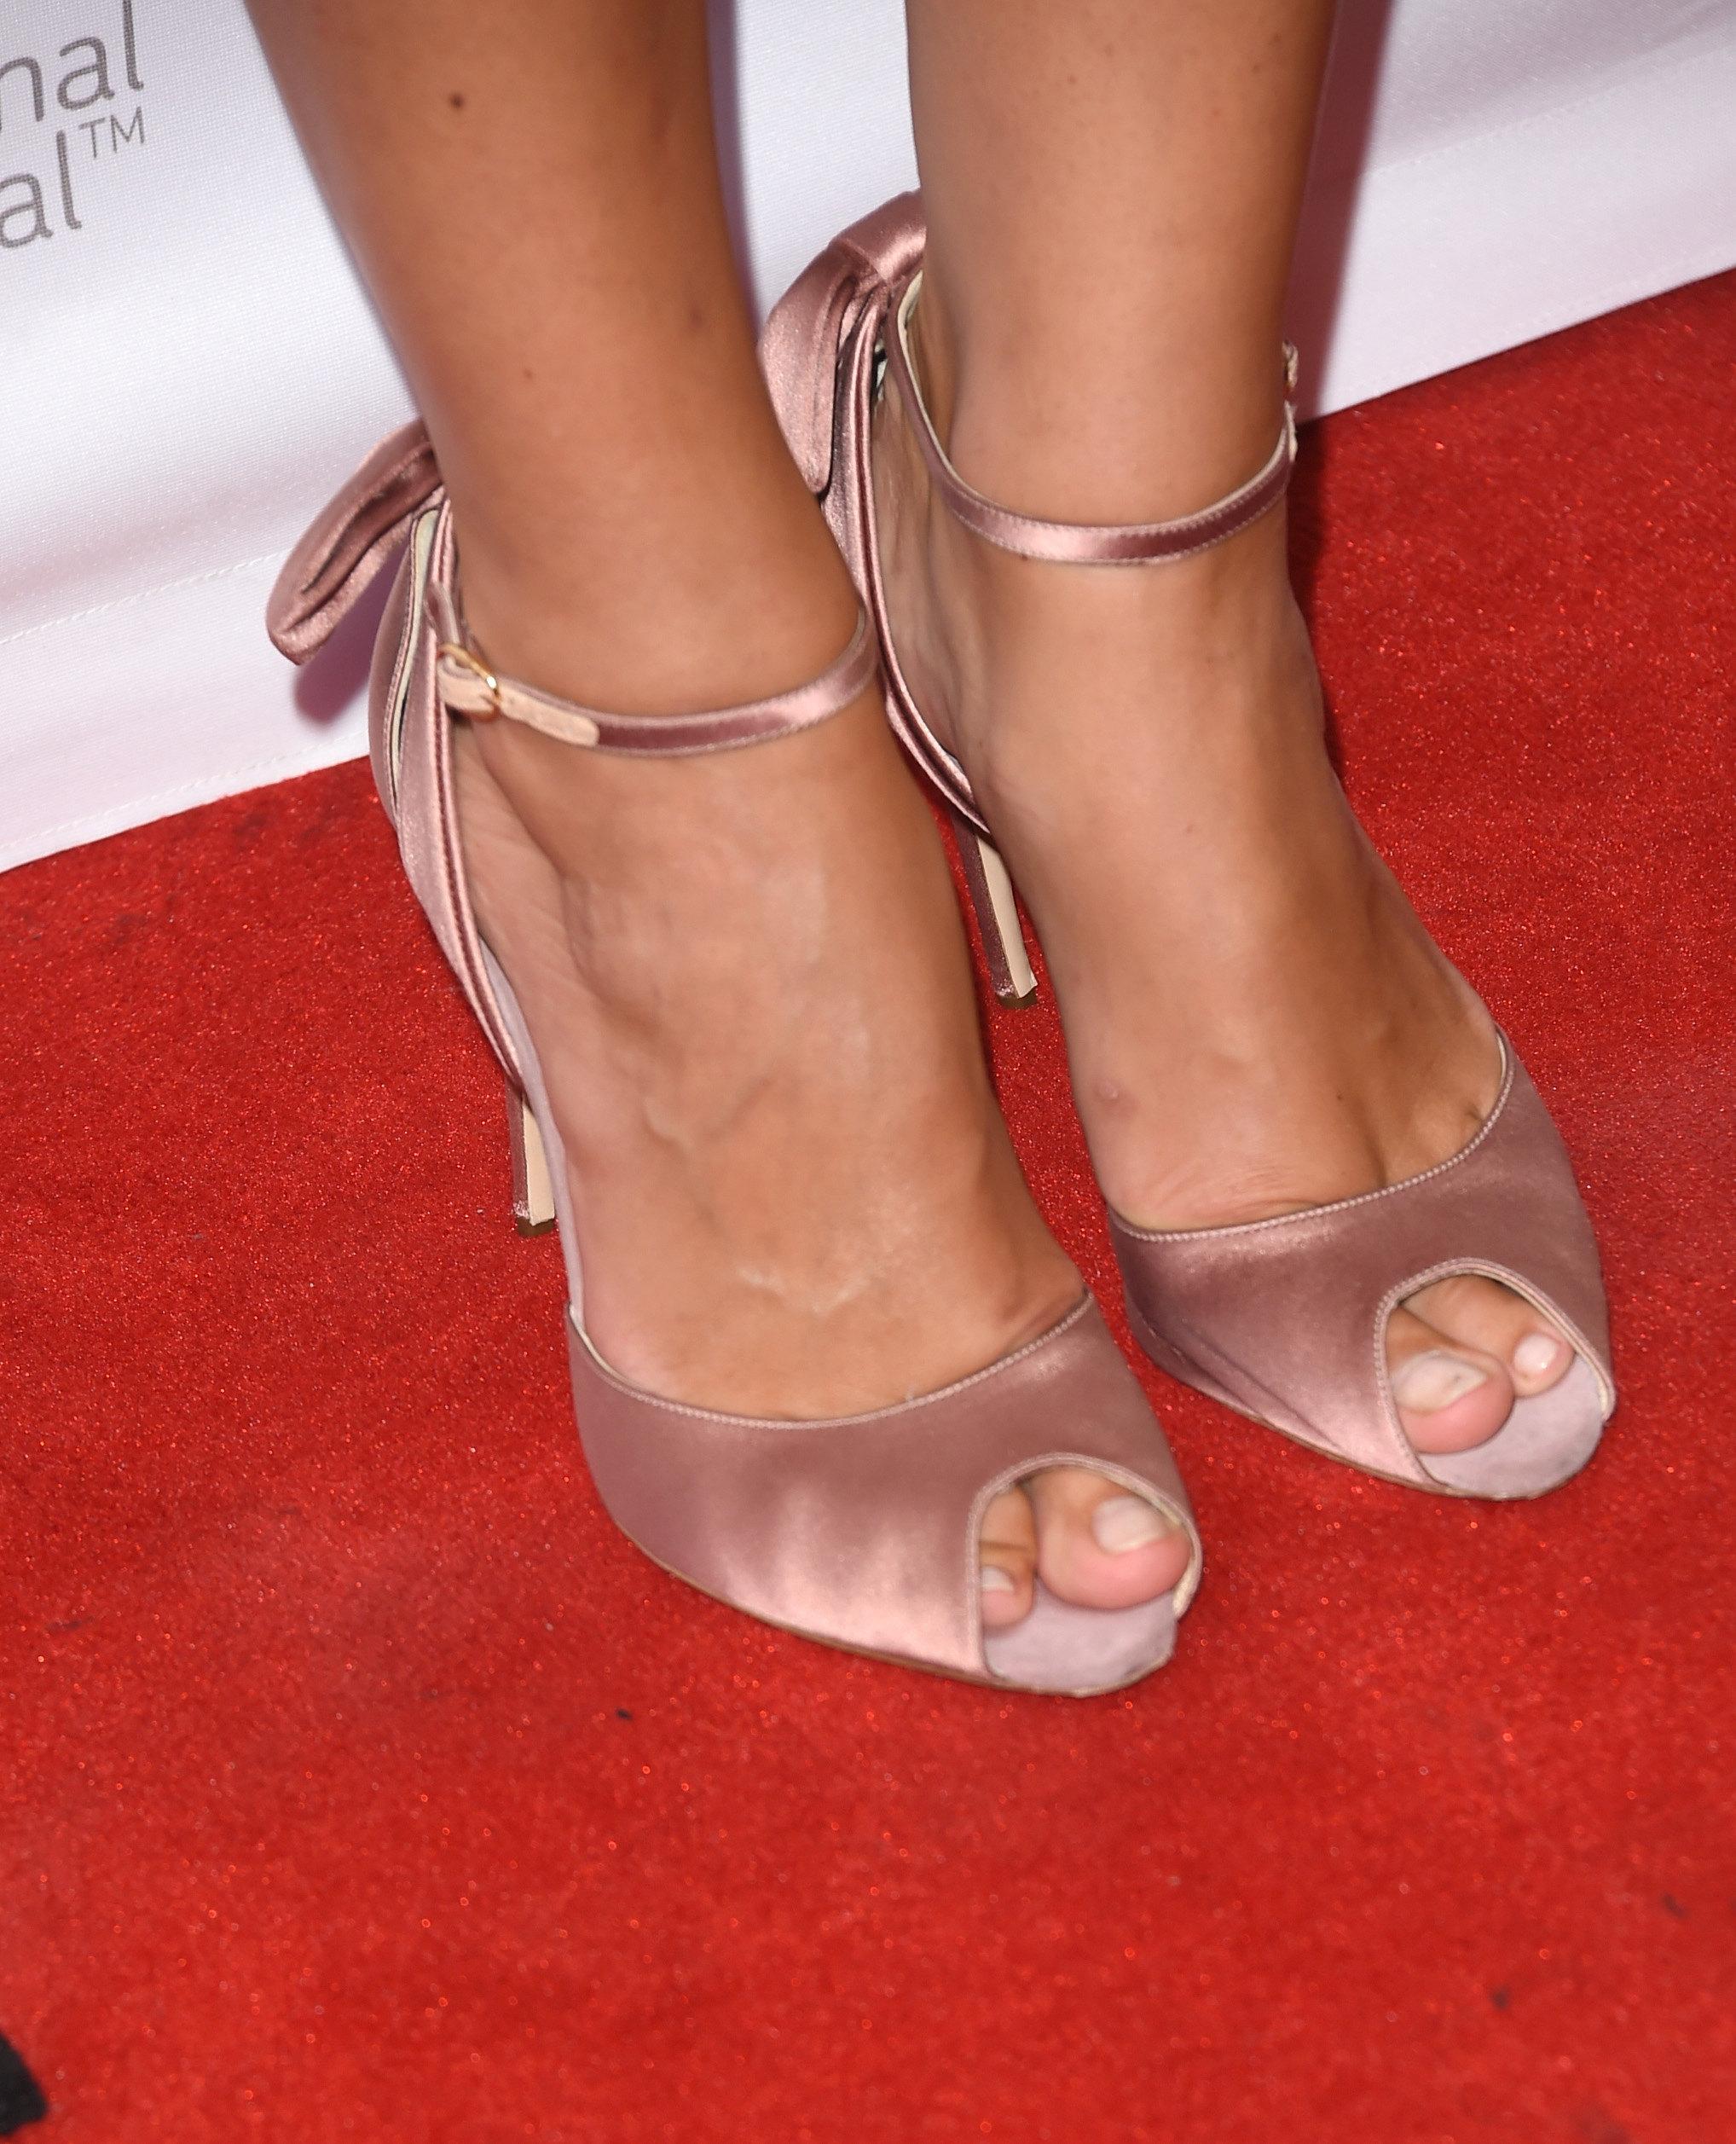 Congratulate, Keira knightley toes think